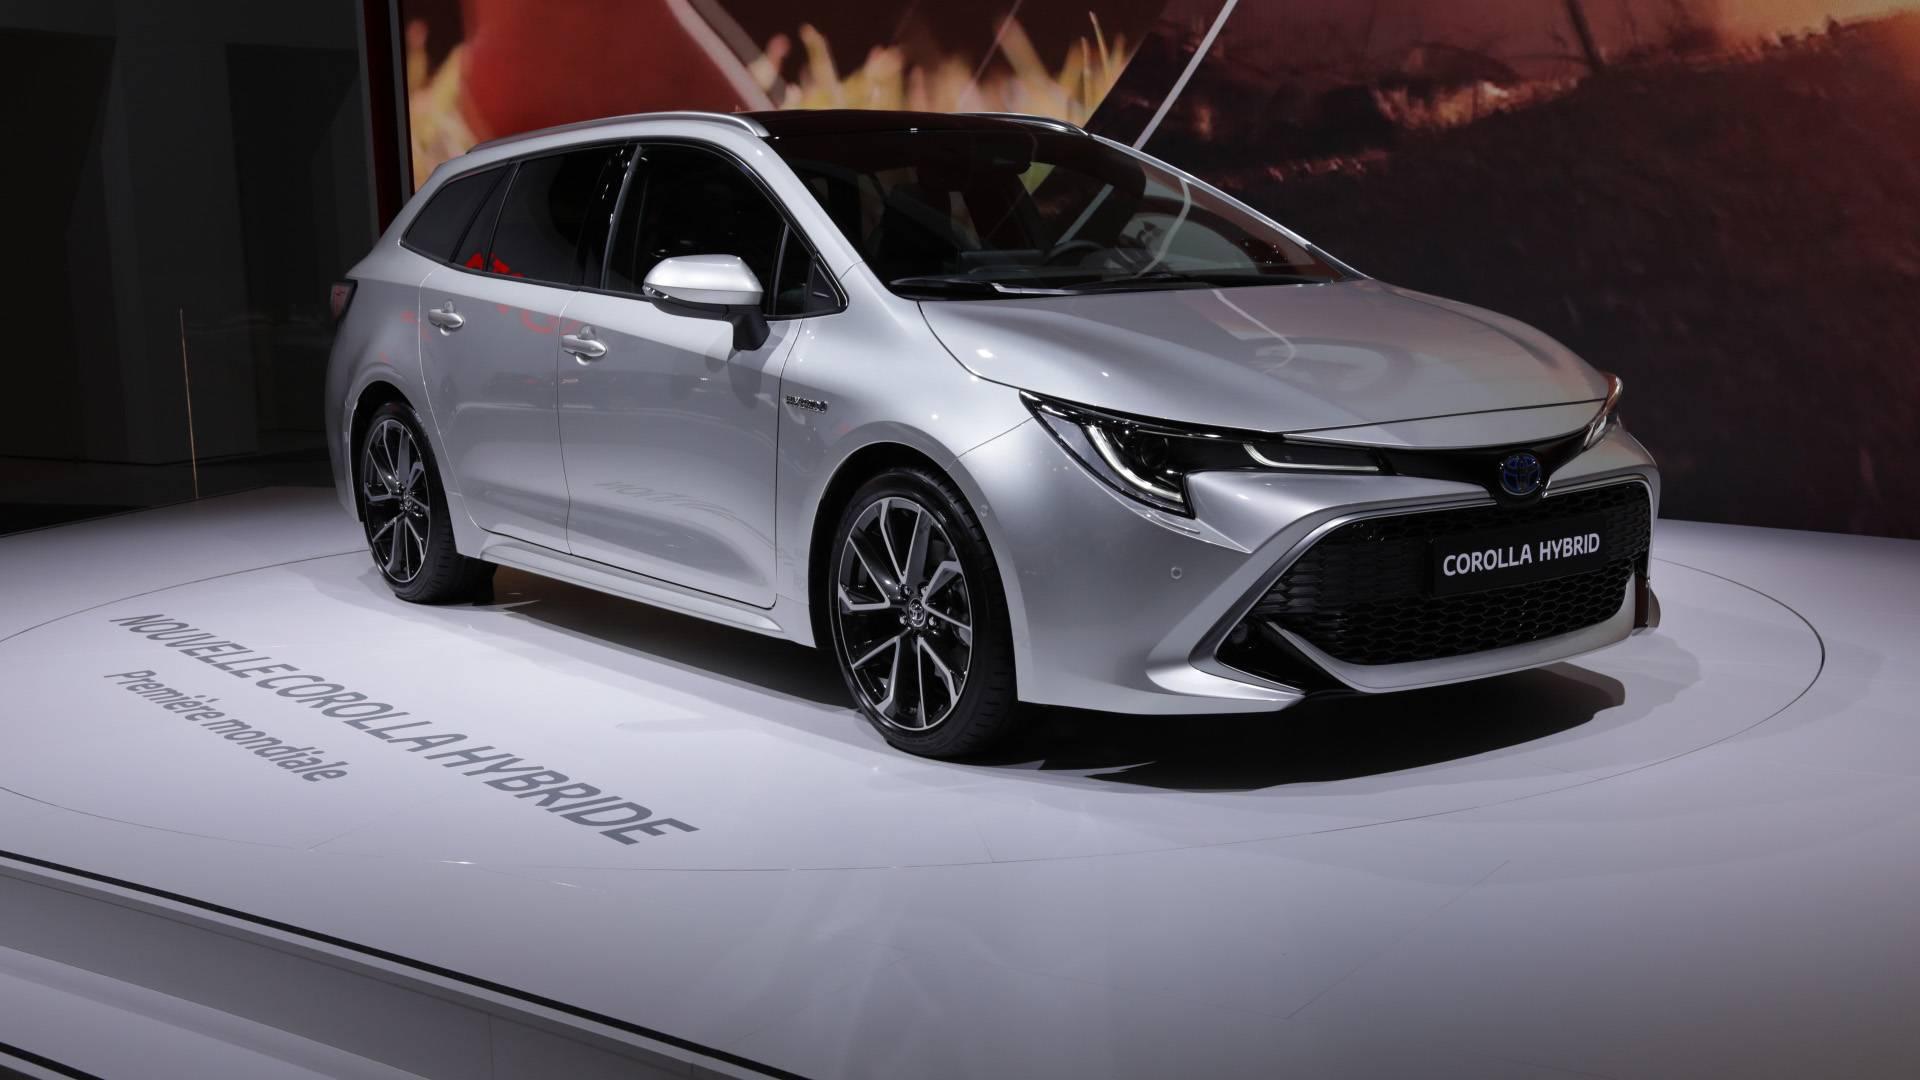 xe-hybrid-tro-thanh-tam-diem-tai-trien-lam-paris-motor-show